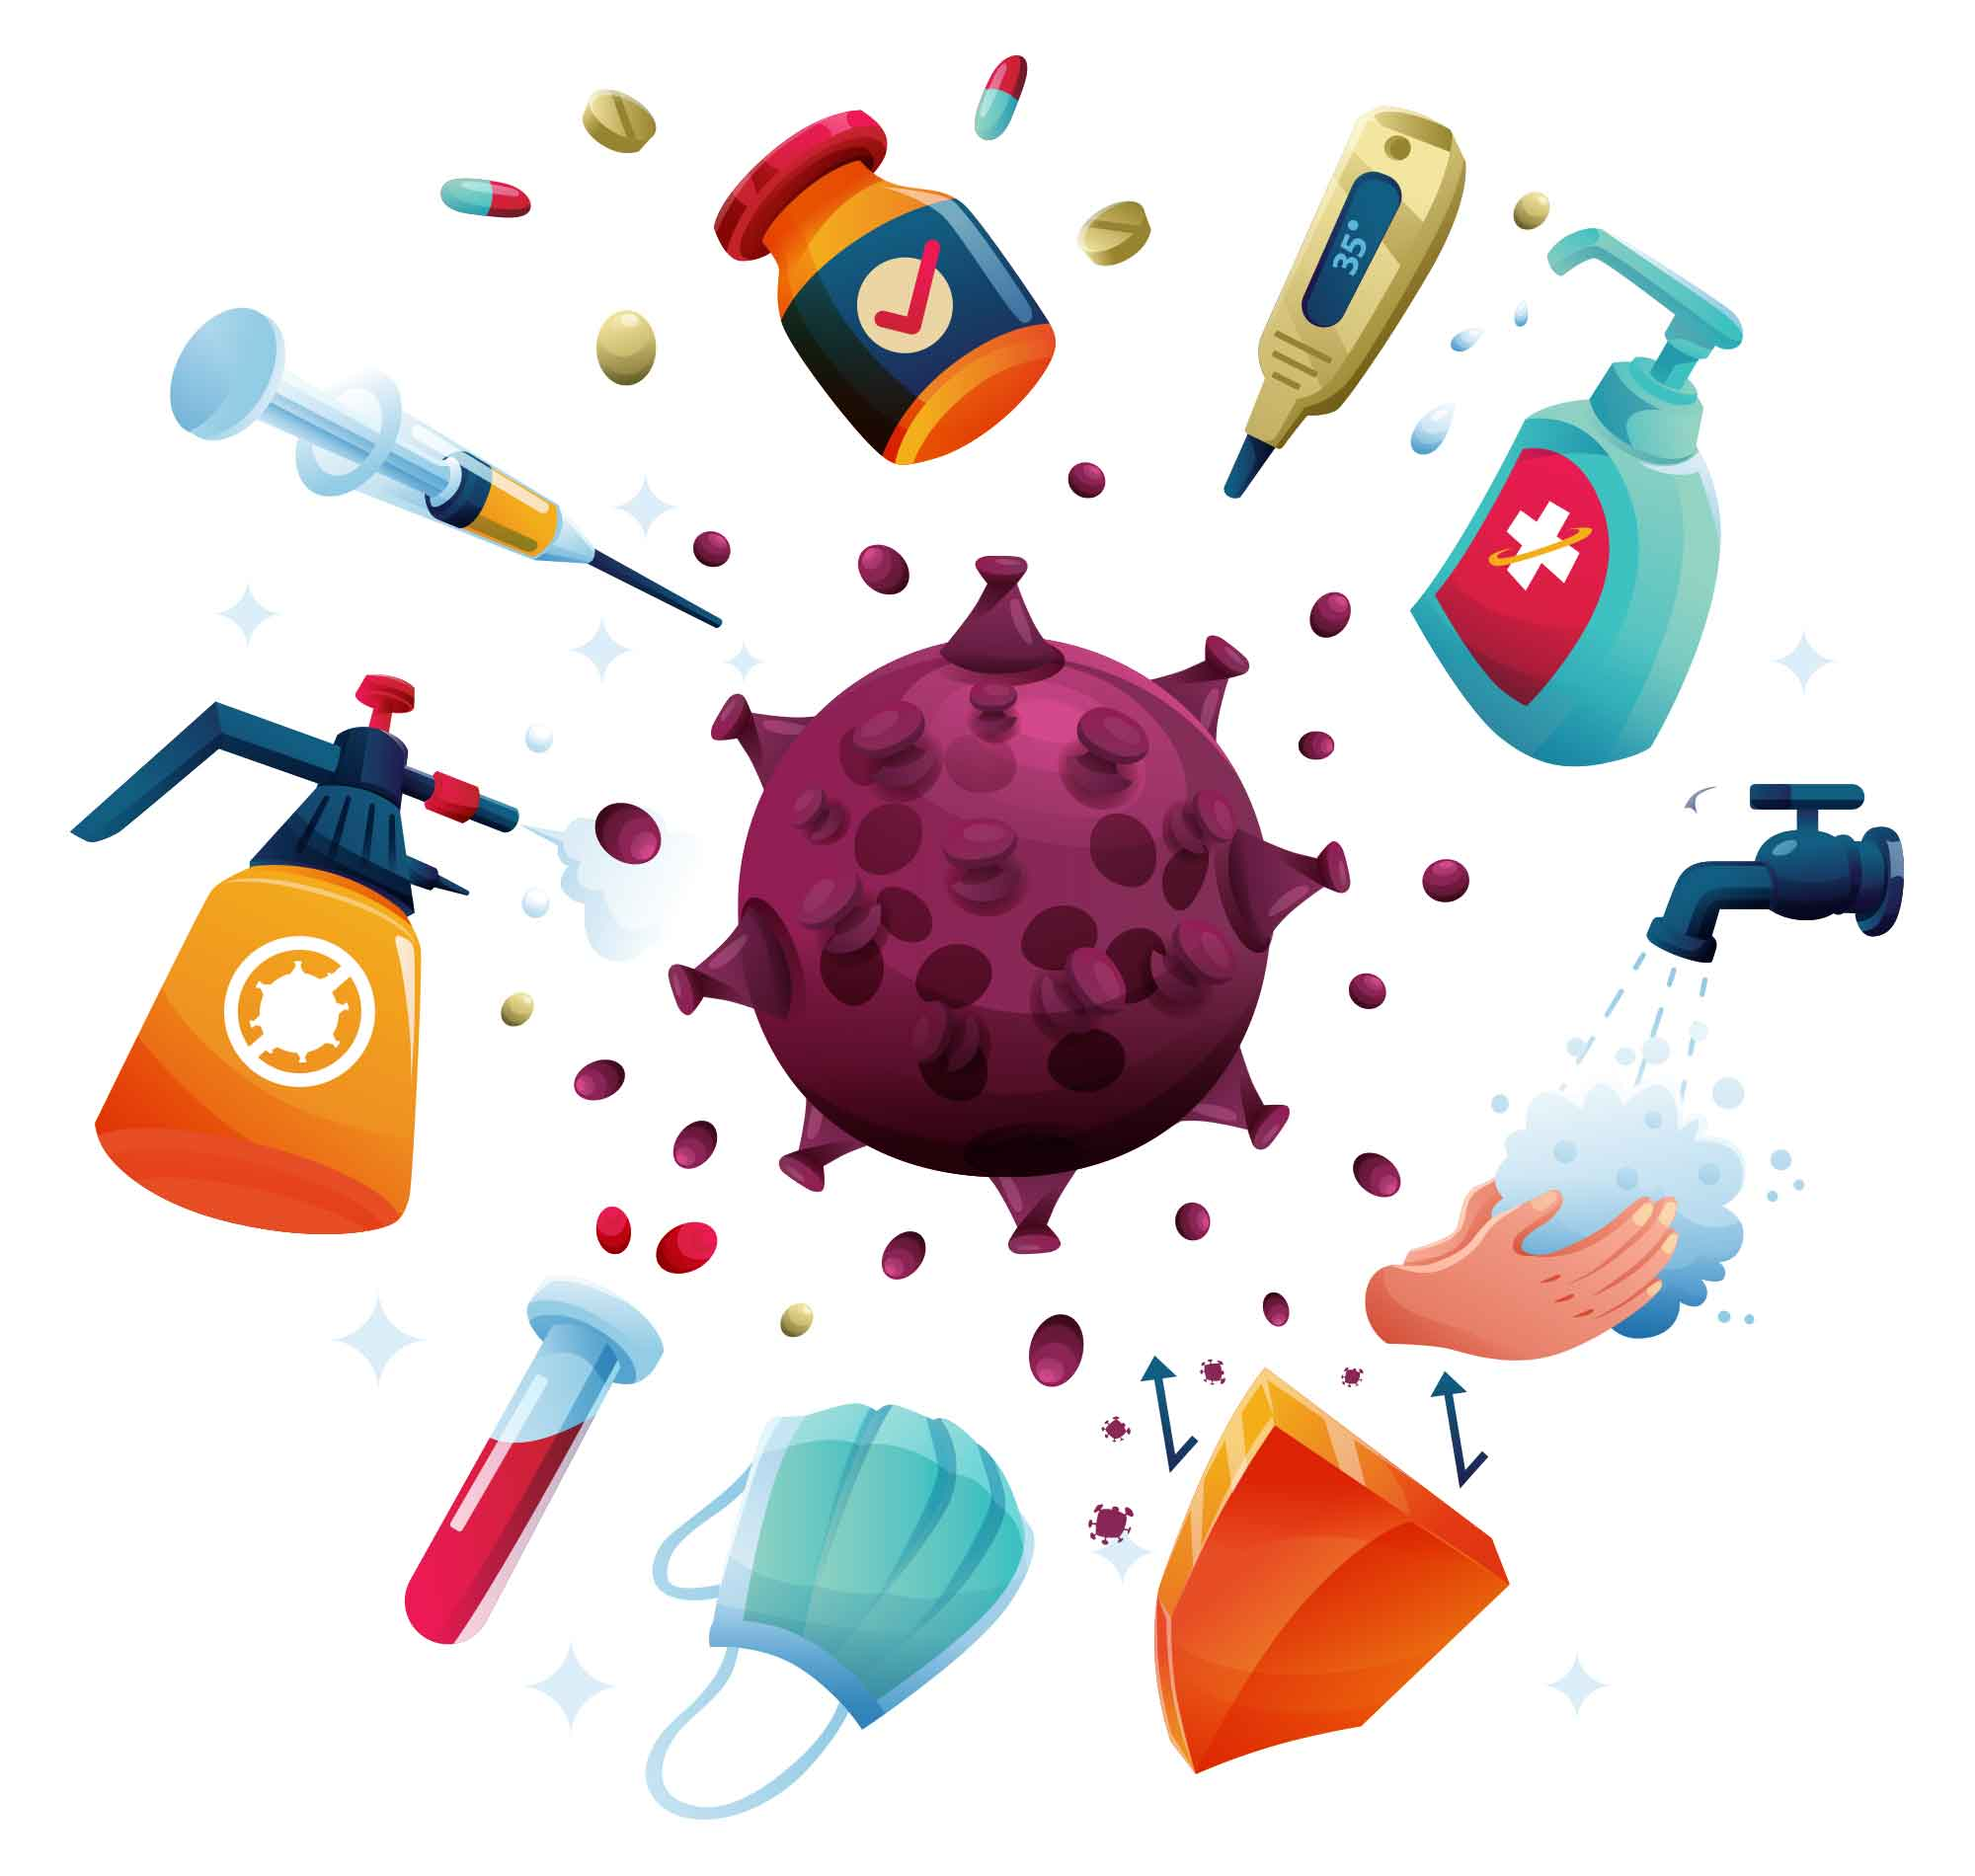 Coronavirus Sanitizing & Vaccination Illustration